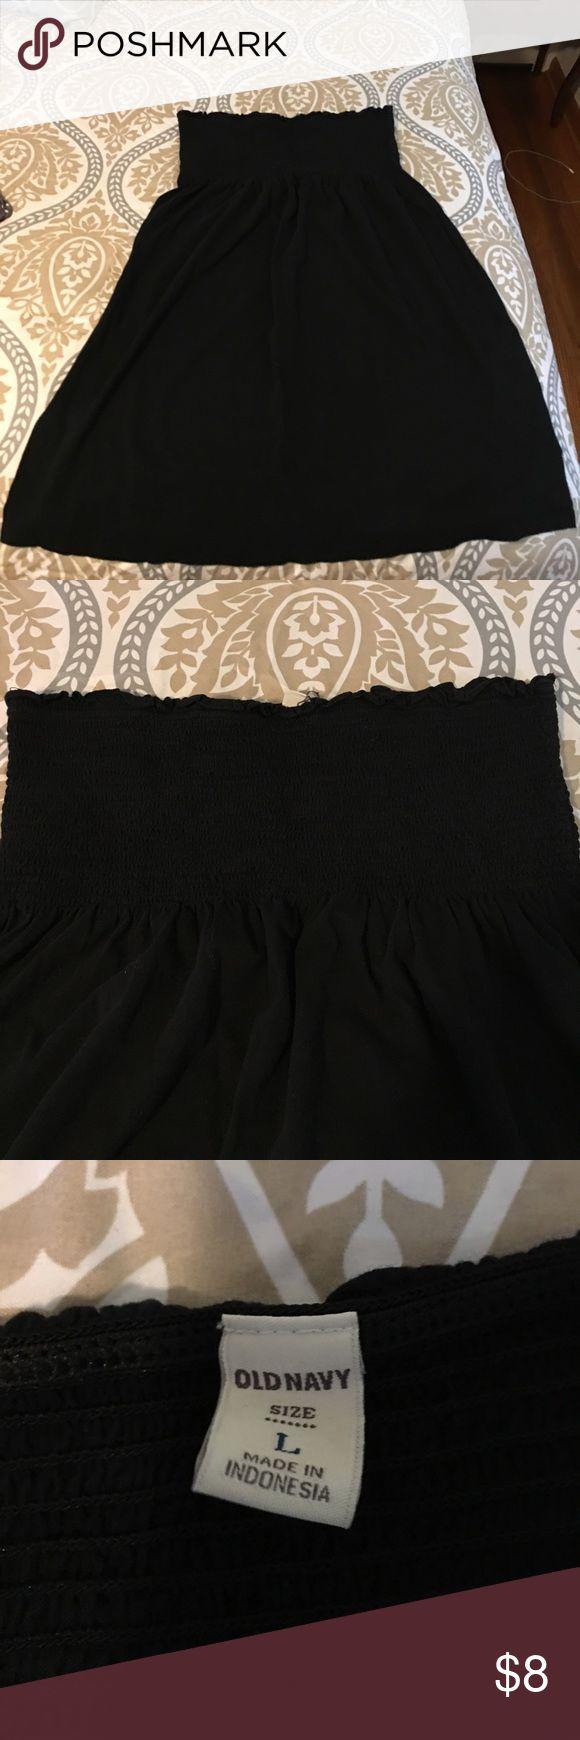 Swim suit dress Black bandeau top swim suit cover up, never worn, perfect condition! Old Navy Swim Coverups